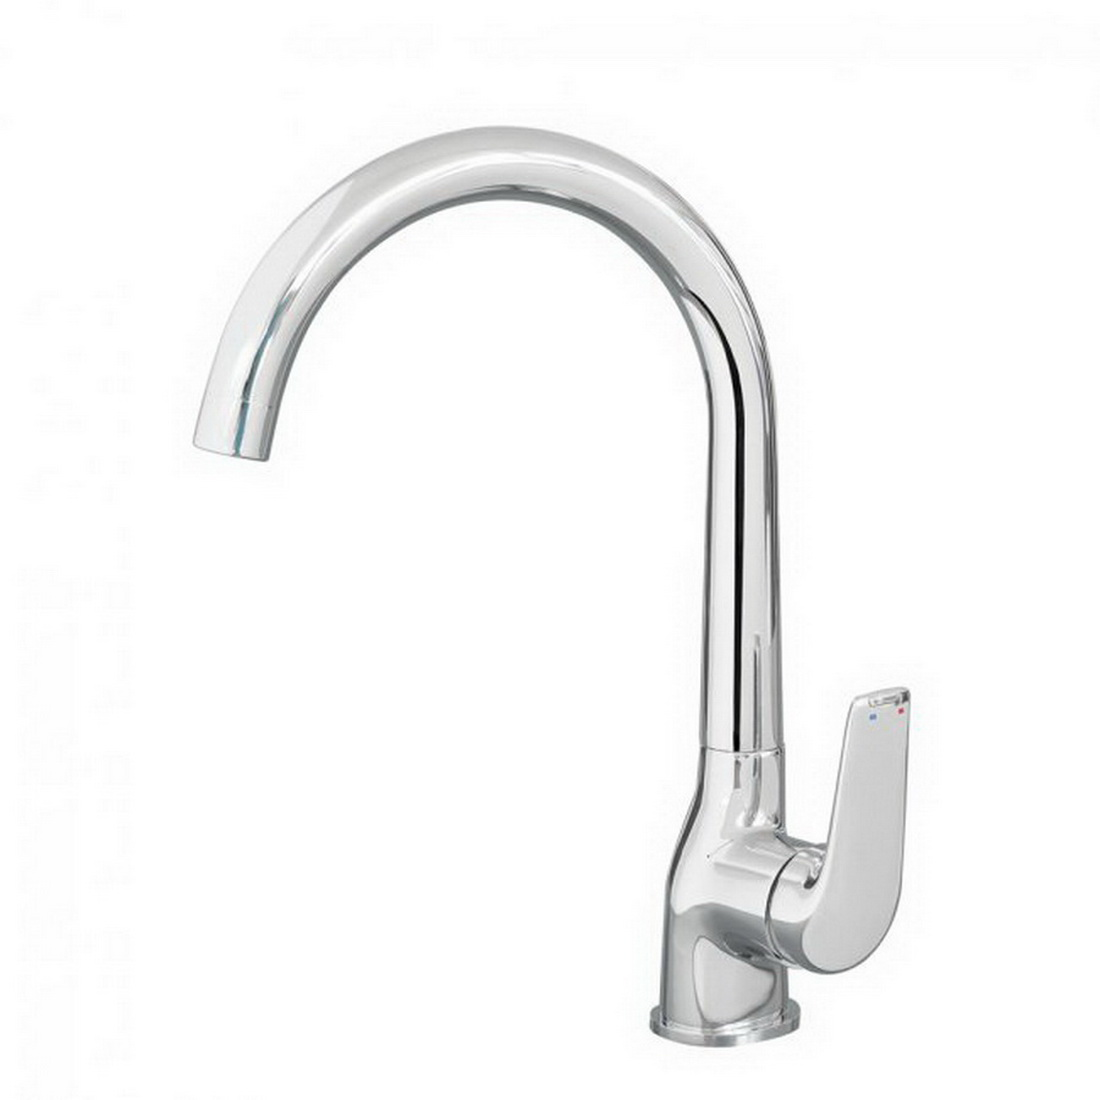 Saluto All Pressure Sink Mixer Chrome